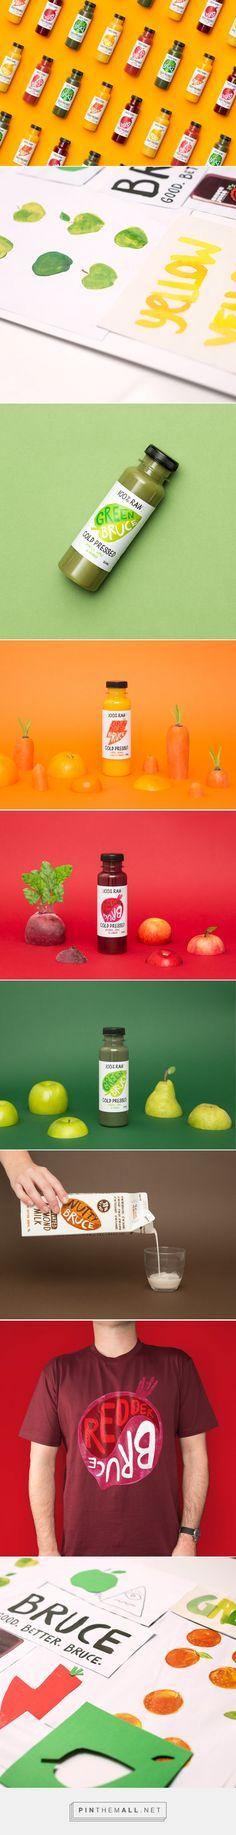 Bruce Juice Packaging designed by Marx Design - http://www.packagingoftheworld.com/2015/10/bruce-juice.html